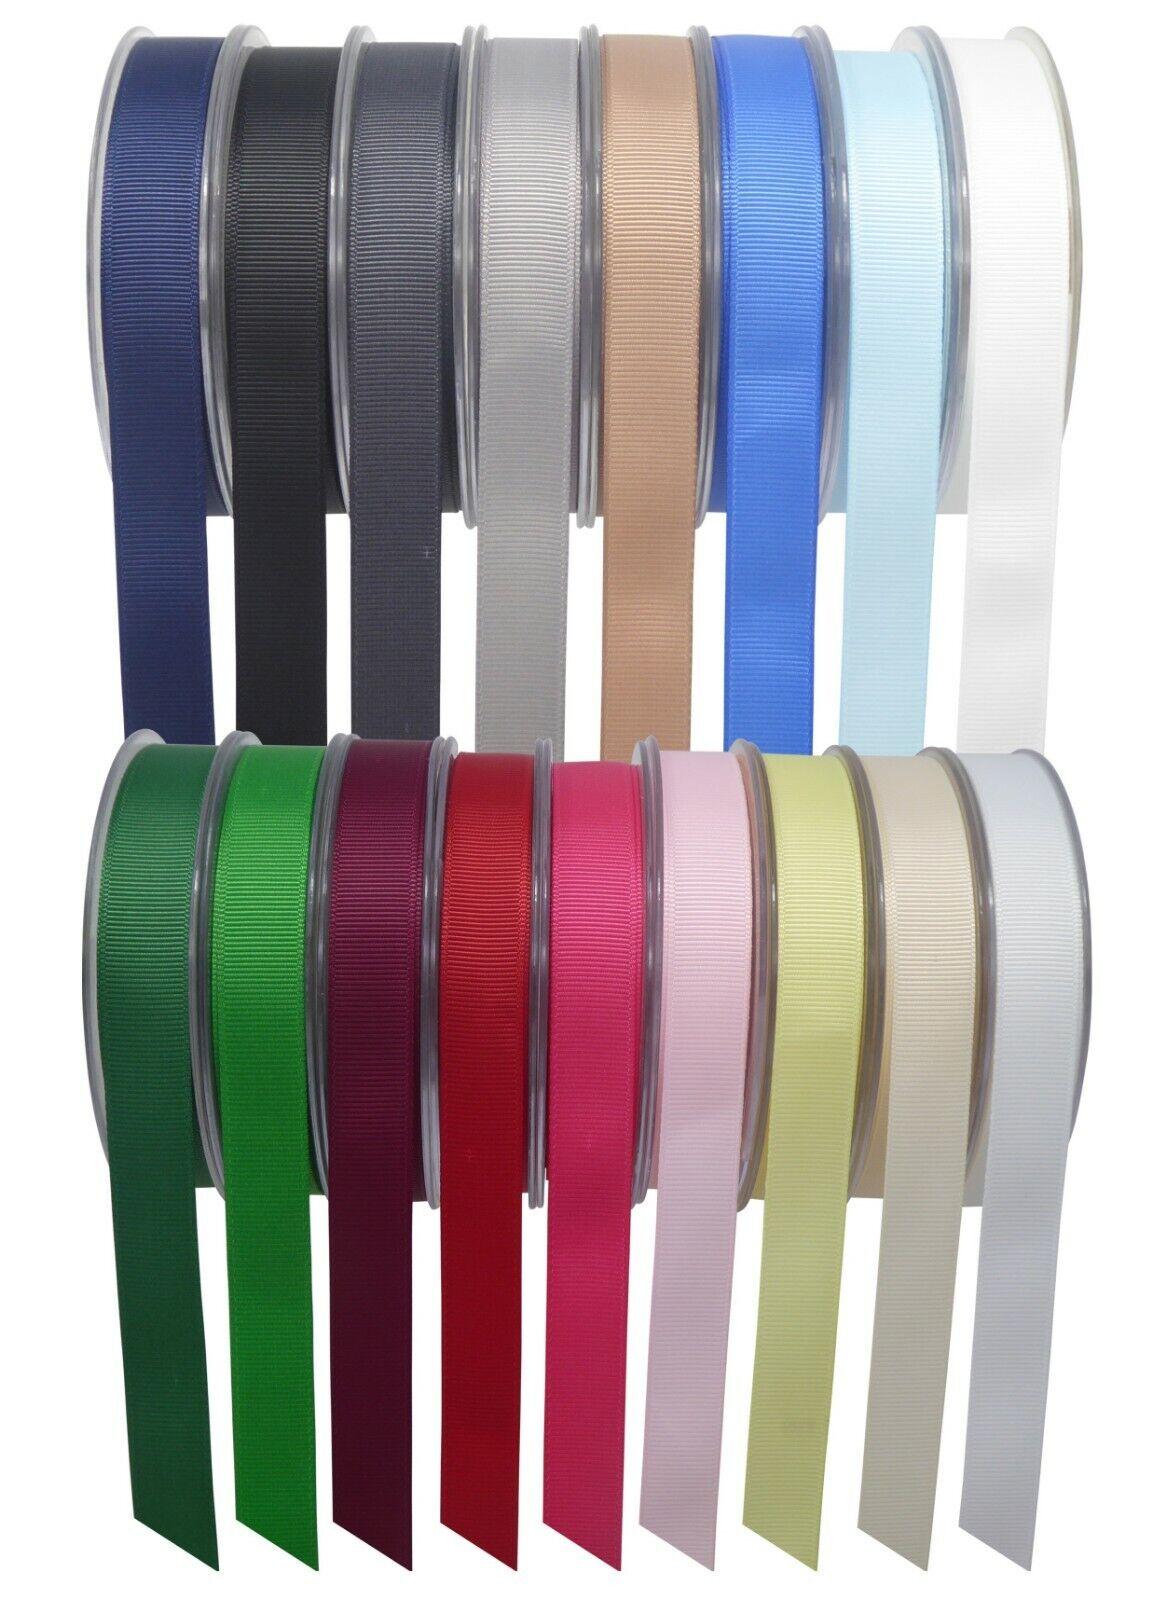 Grosgrain Ribbon Ivory White 40 Metres 25mm Total 2 Reels